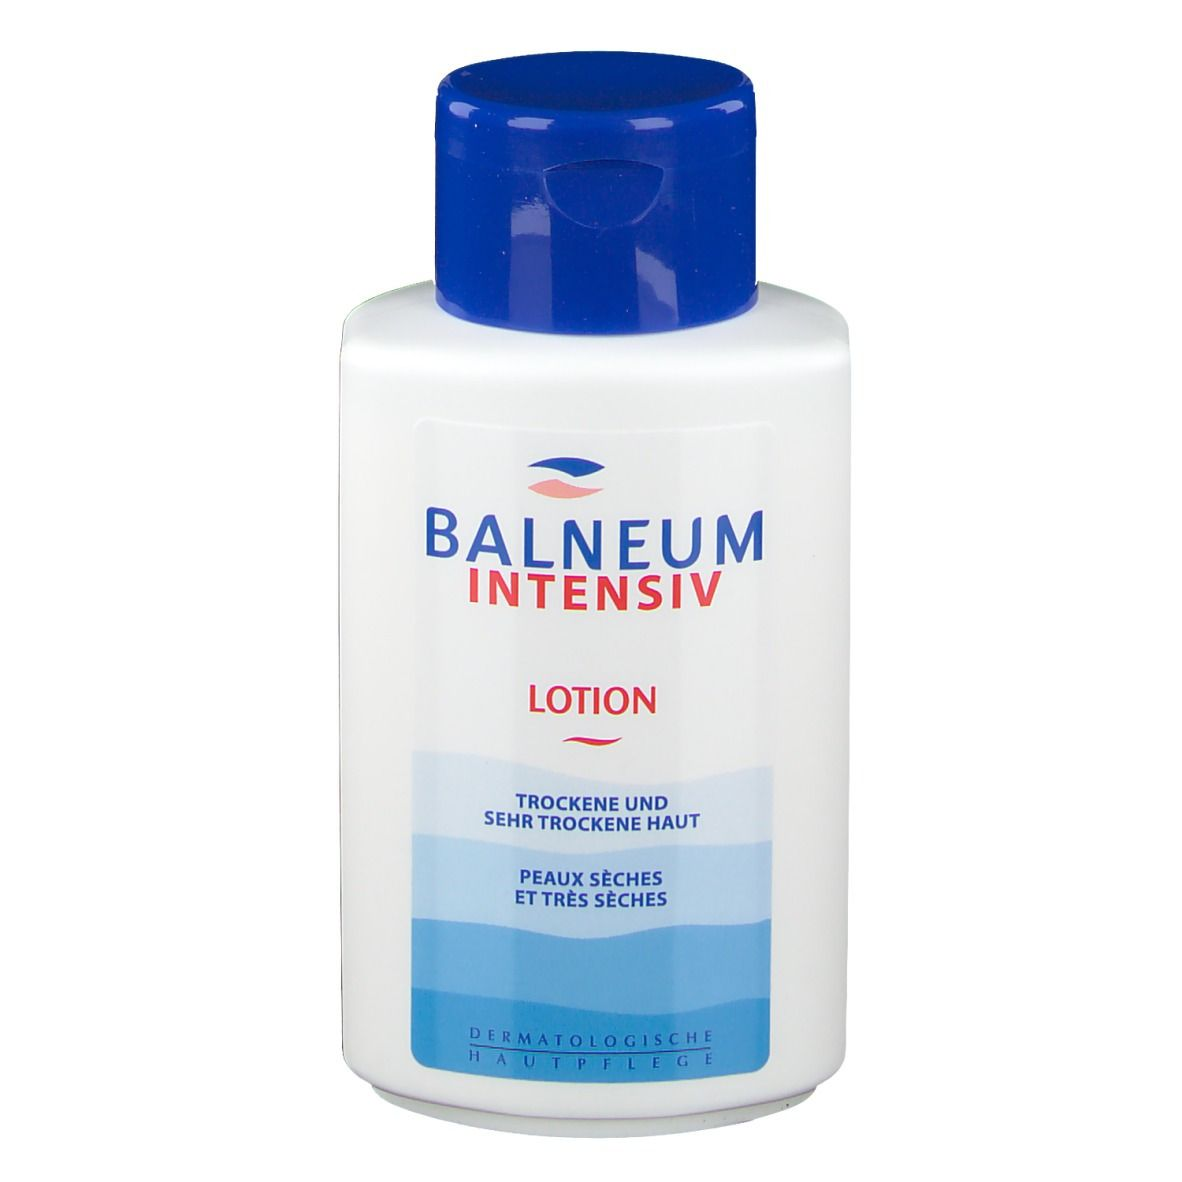 Image of Balneum® Intensiv Lotion